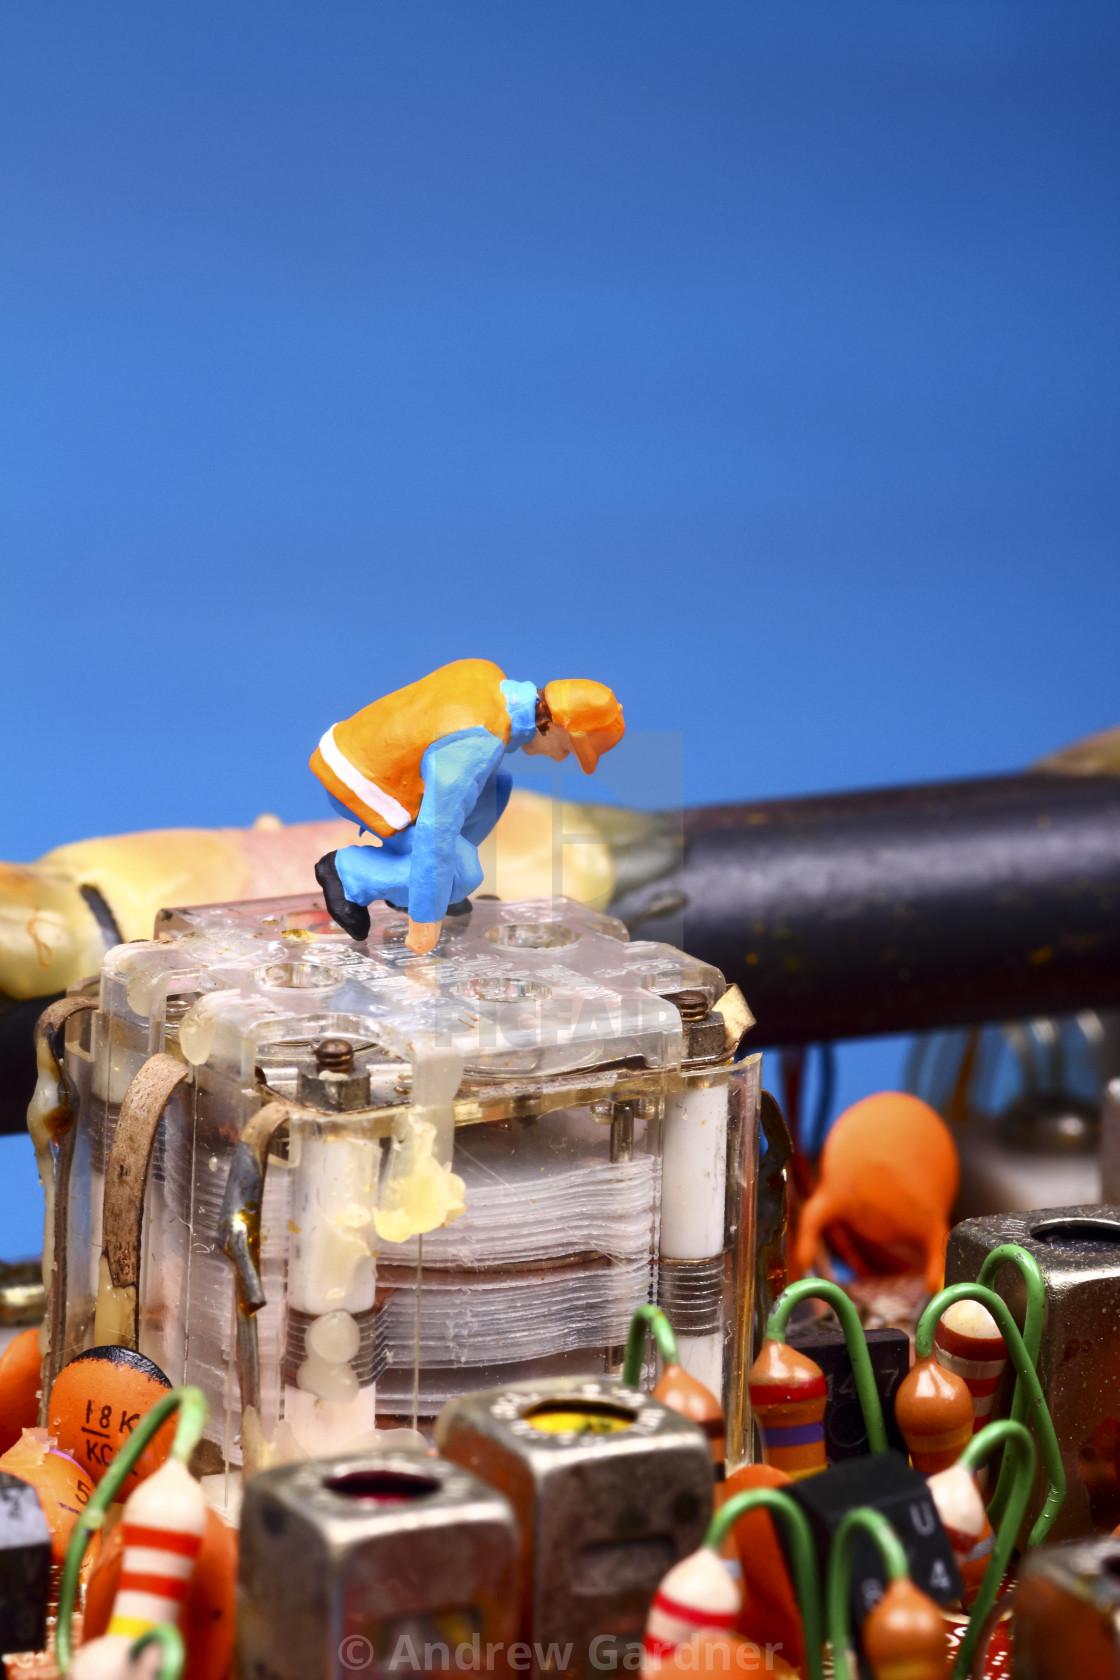 """Miniature figure workman inspecting a vintage radio circuit board radio repair concept"" stock image"